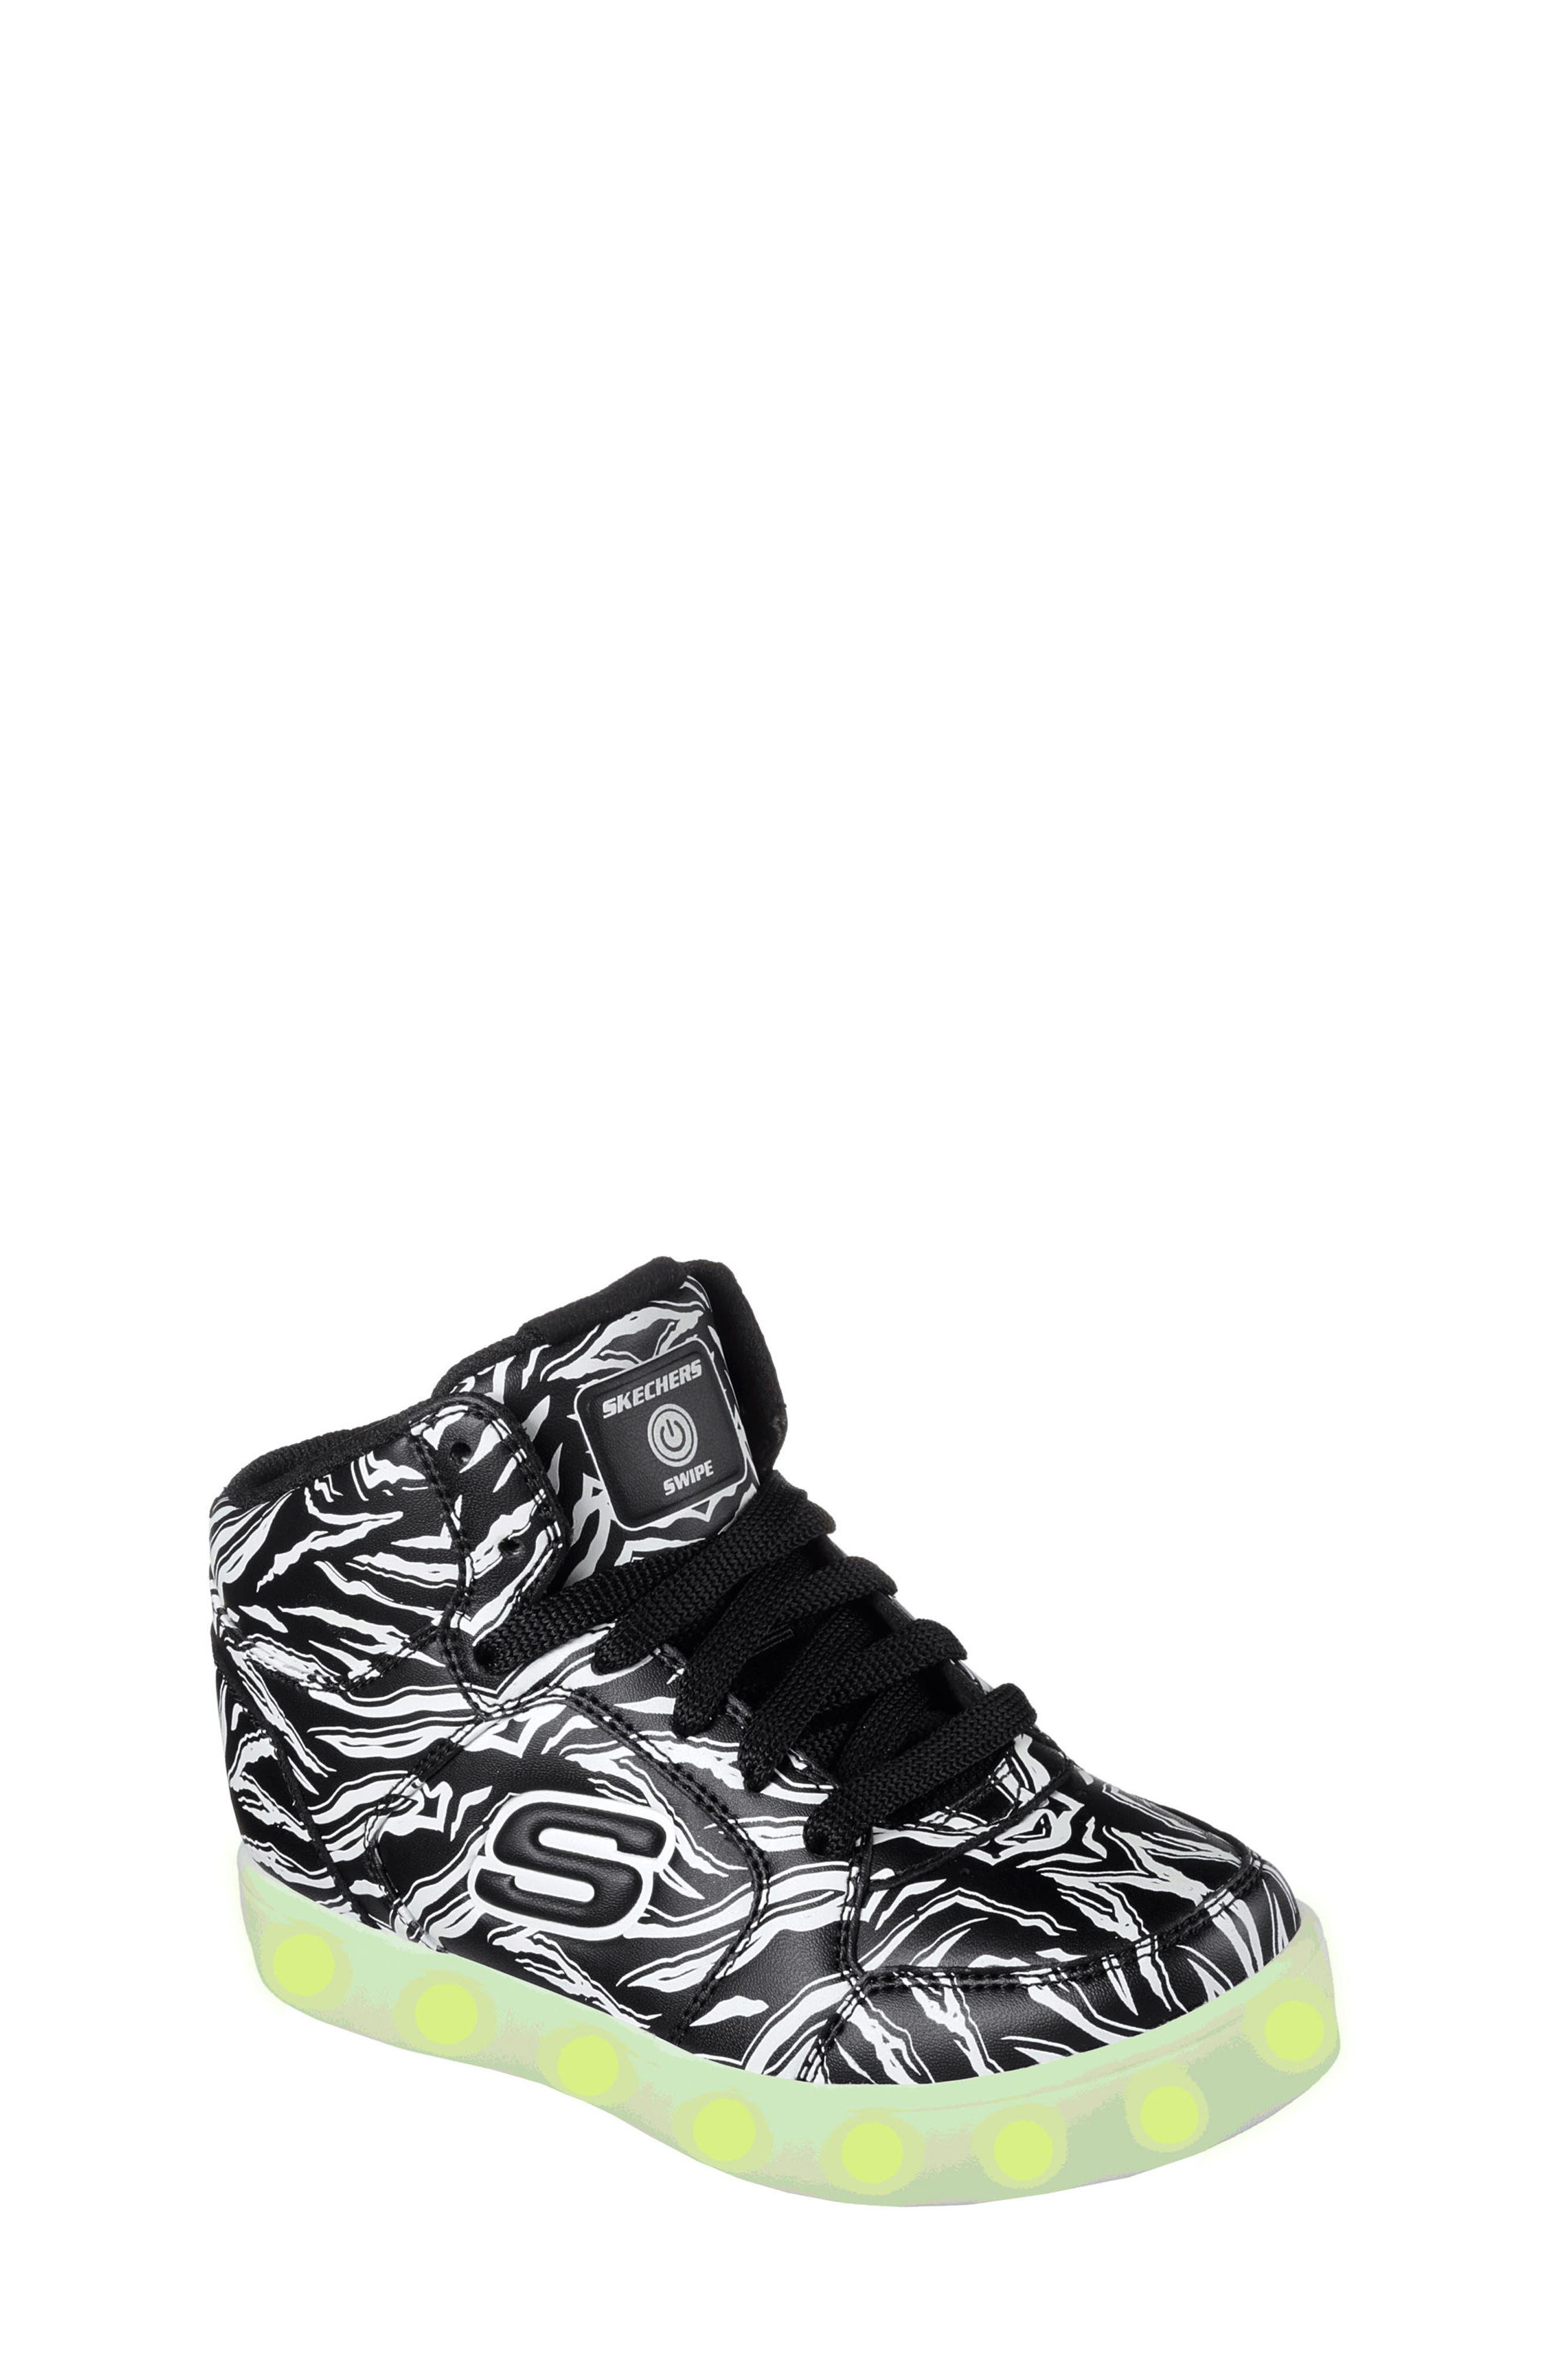 Energy Lights Glow in the Dark Sneaker,                             Alternate thumbnail 10, color,                             017